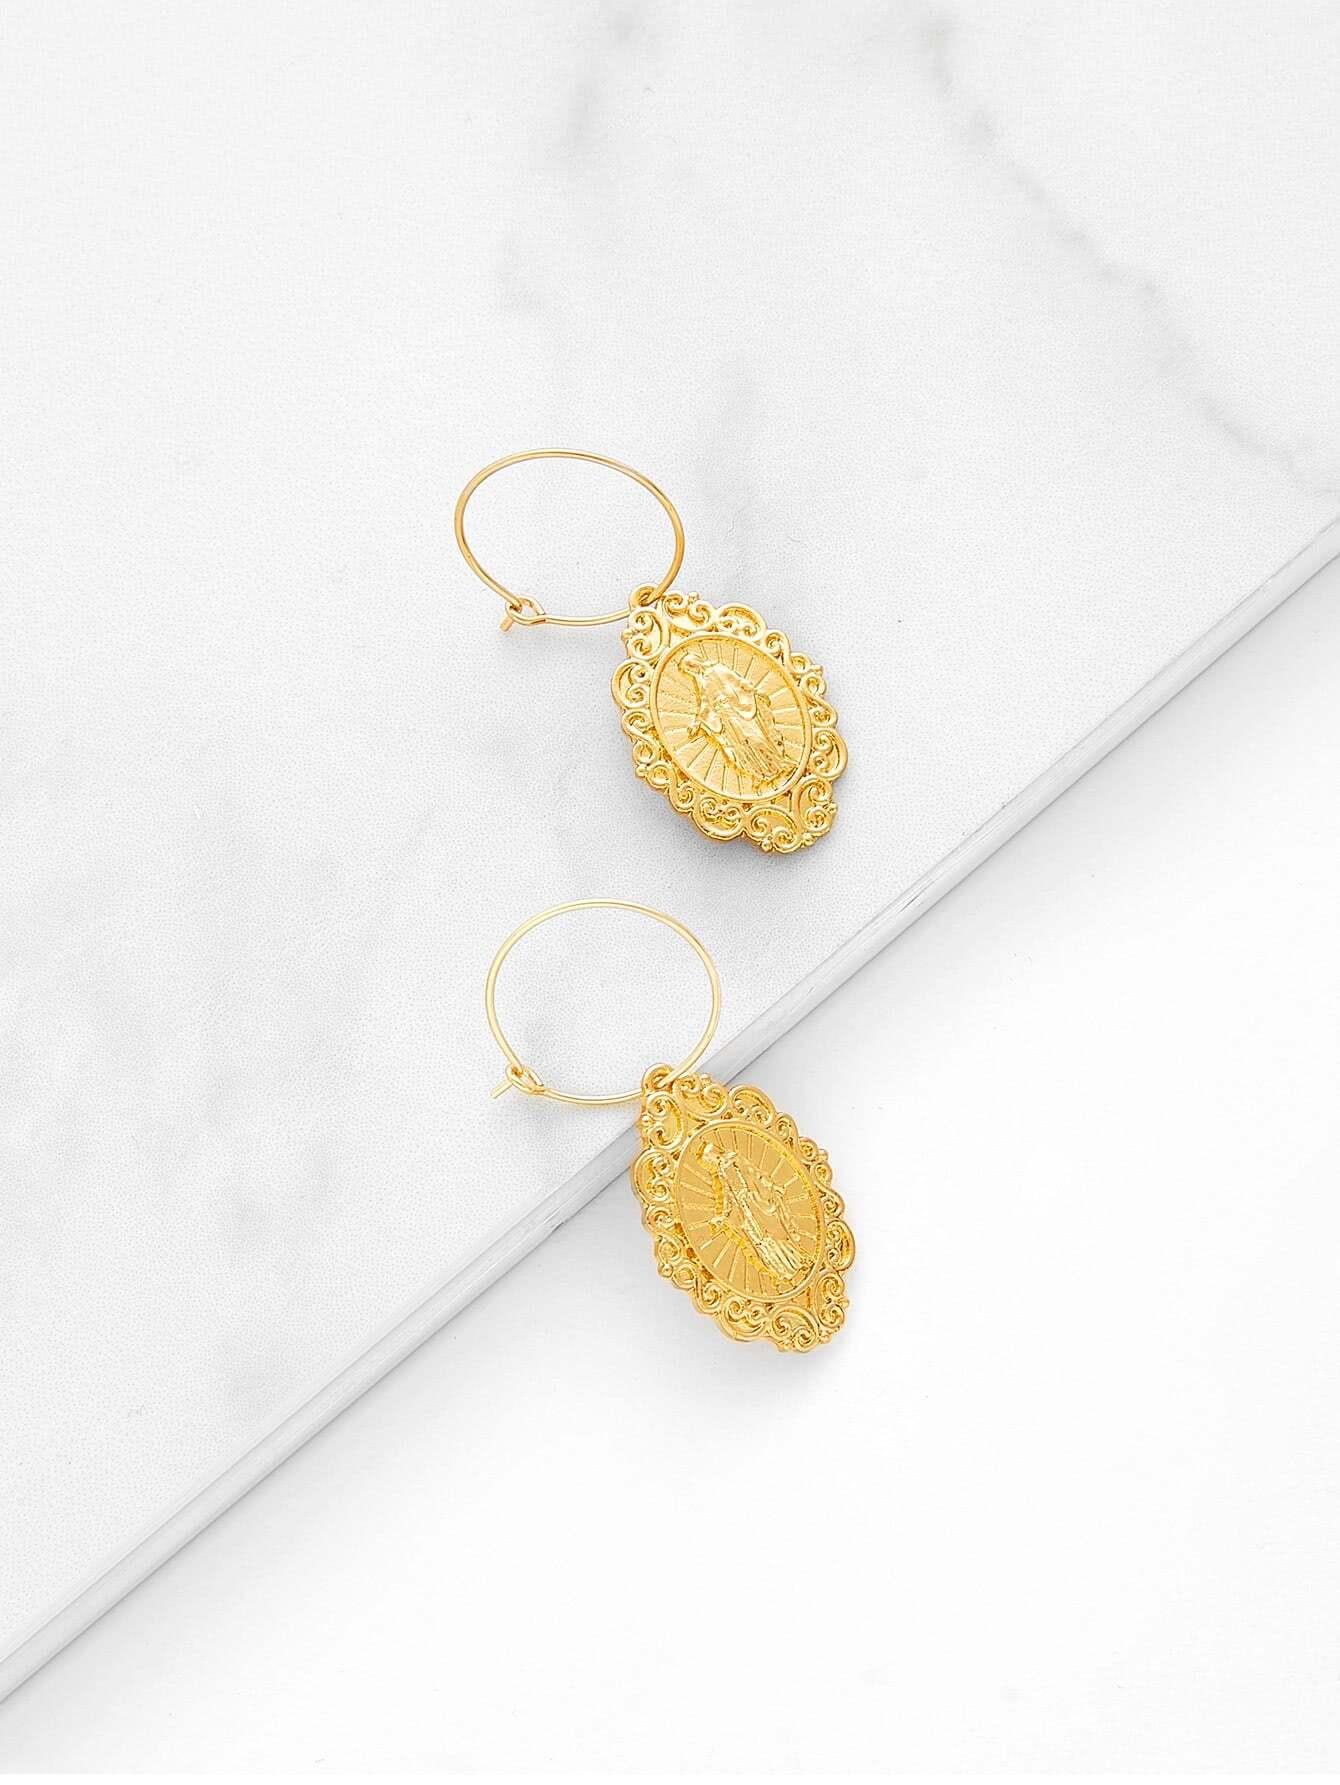 Round Drop Earrings two tone round flake drop earrings